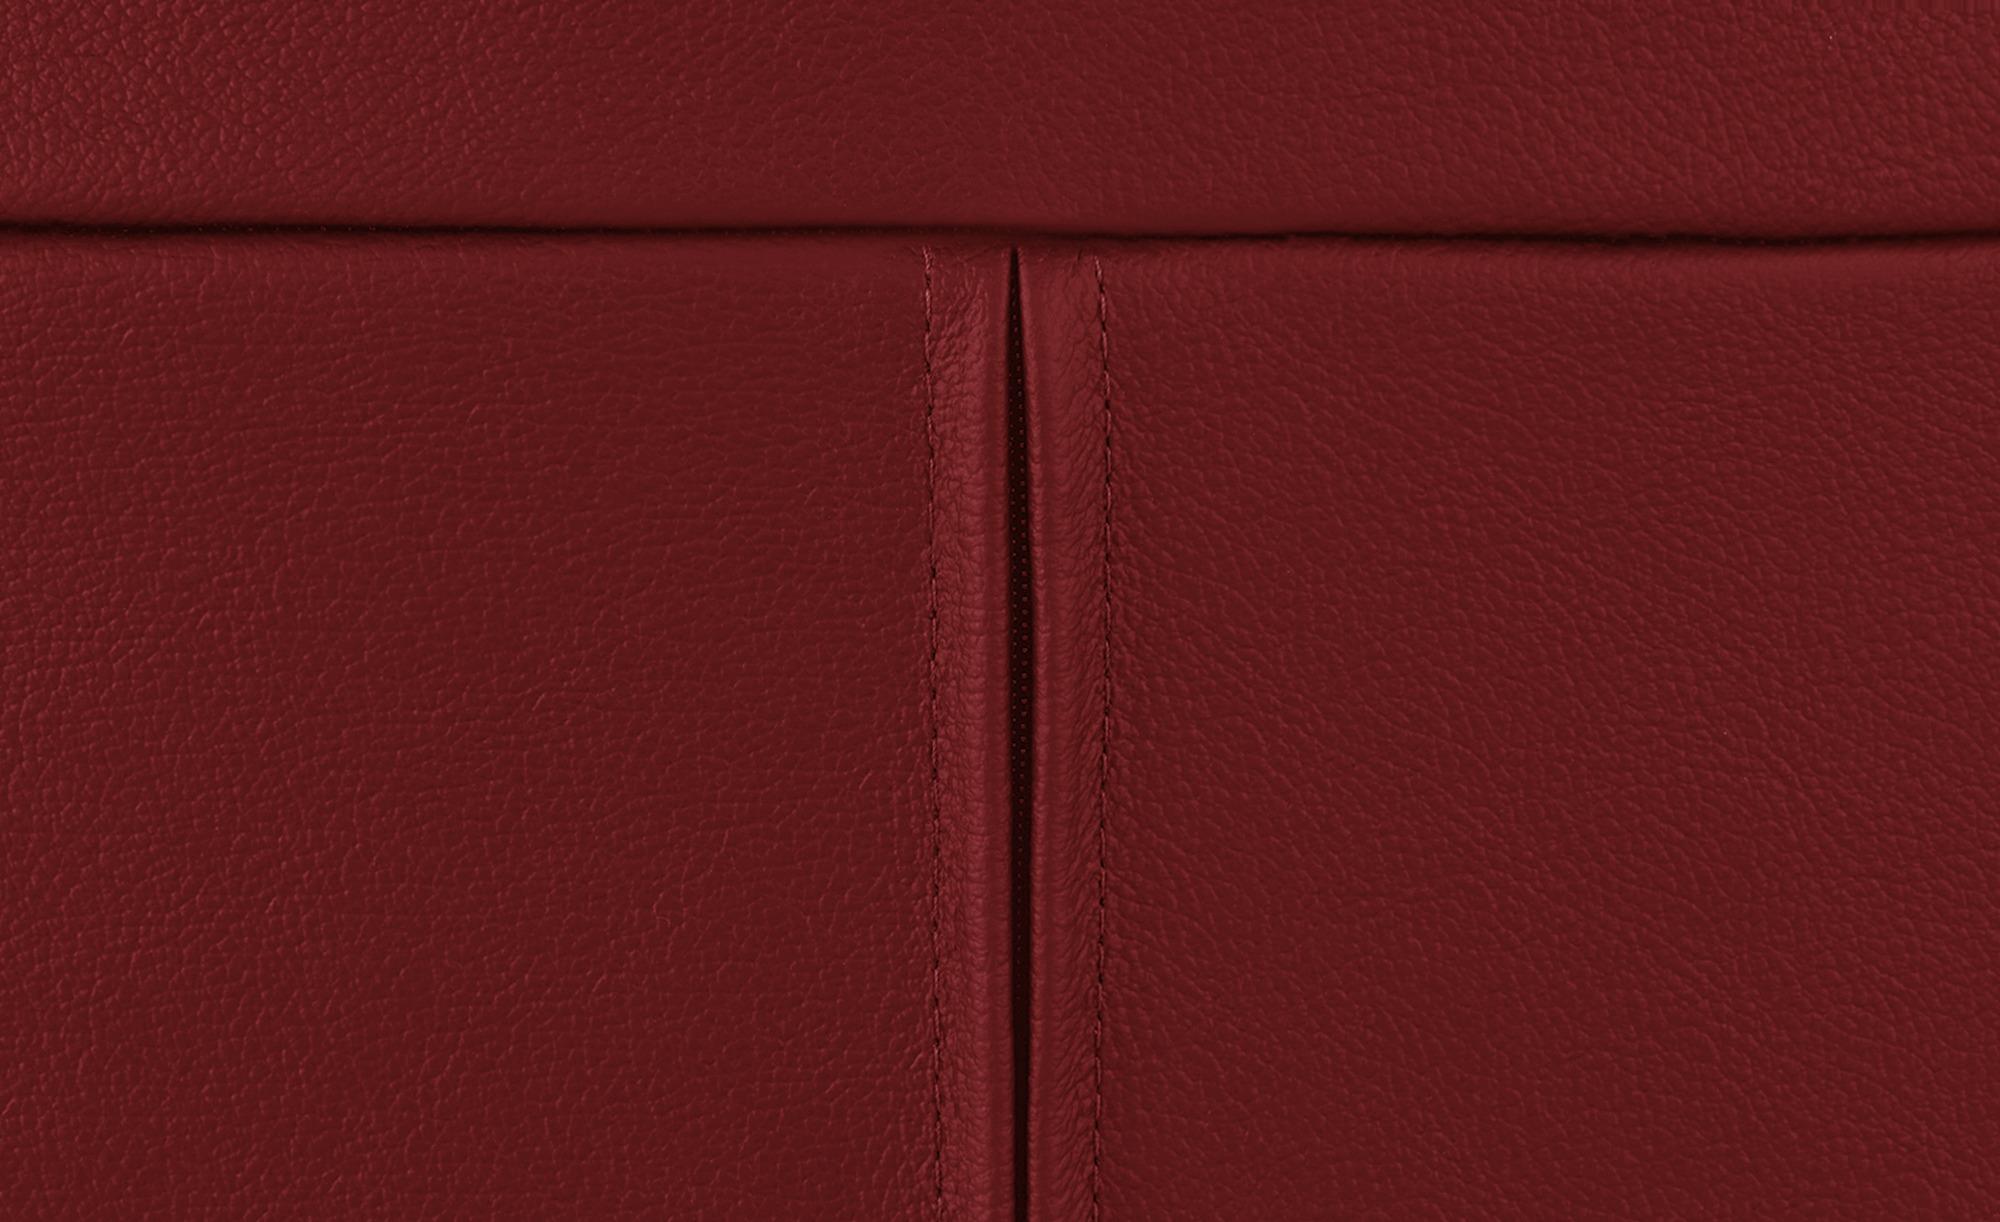 Sessel  Torgen ¦ rot ¦ Maße (cm): B: 82 H: 104 T: 90 Polstermöbel > Sessel > Ledersessel - Höffner